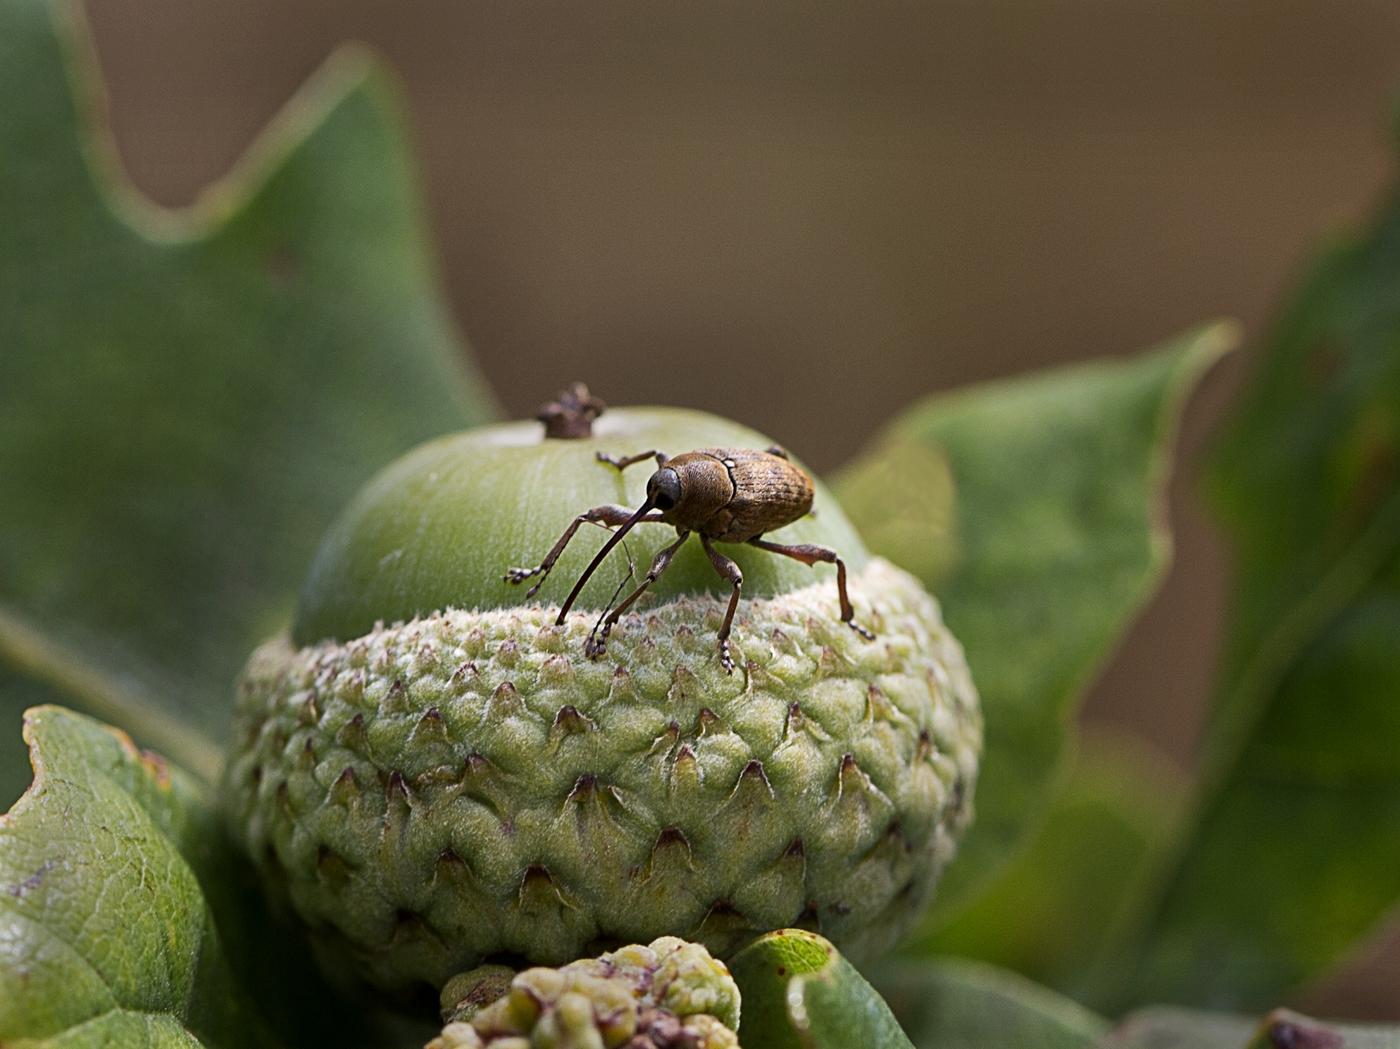 Weevil feeding on acorn